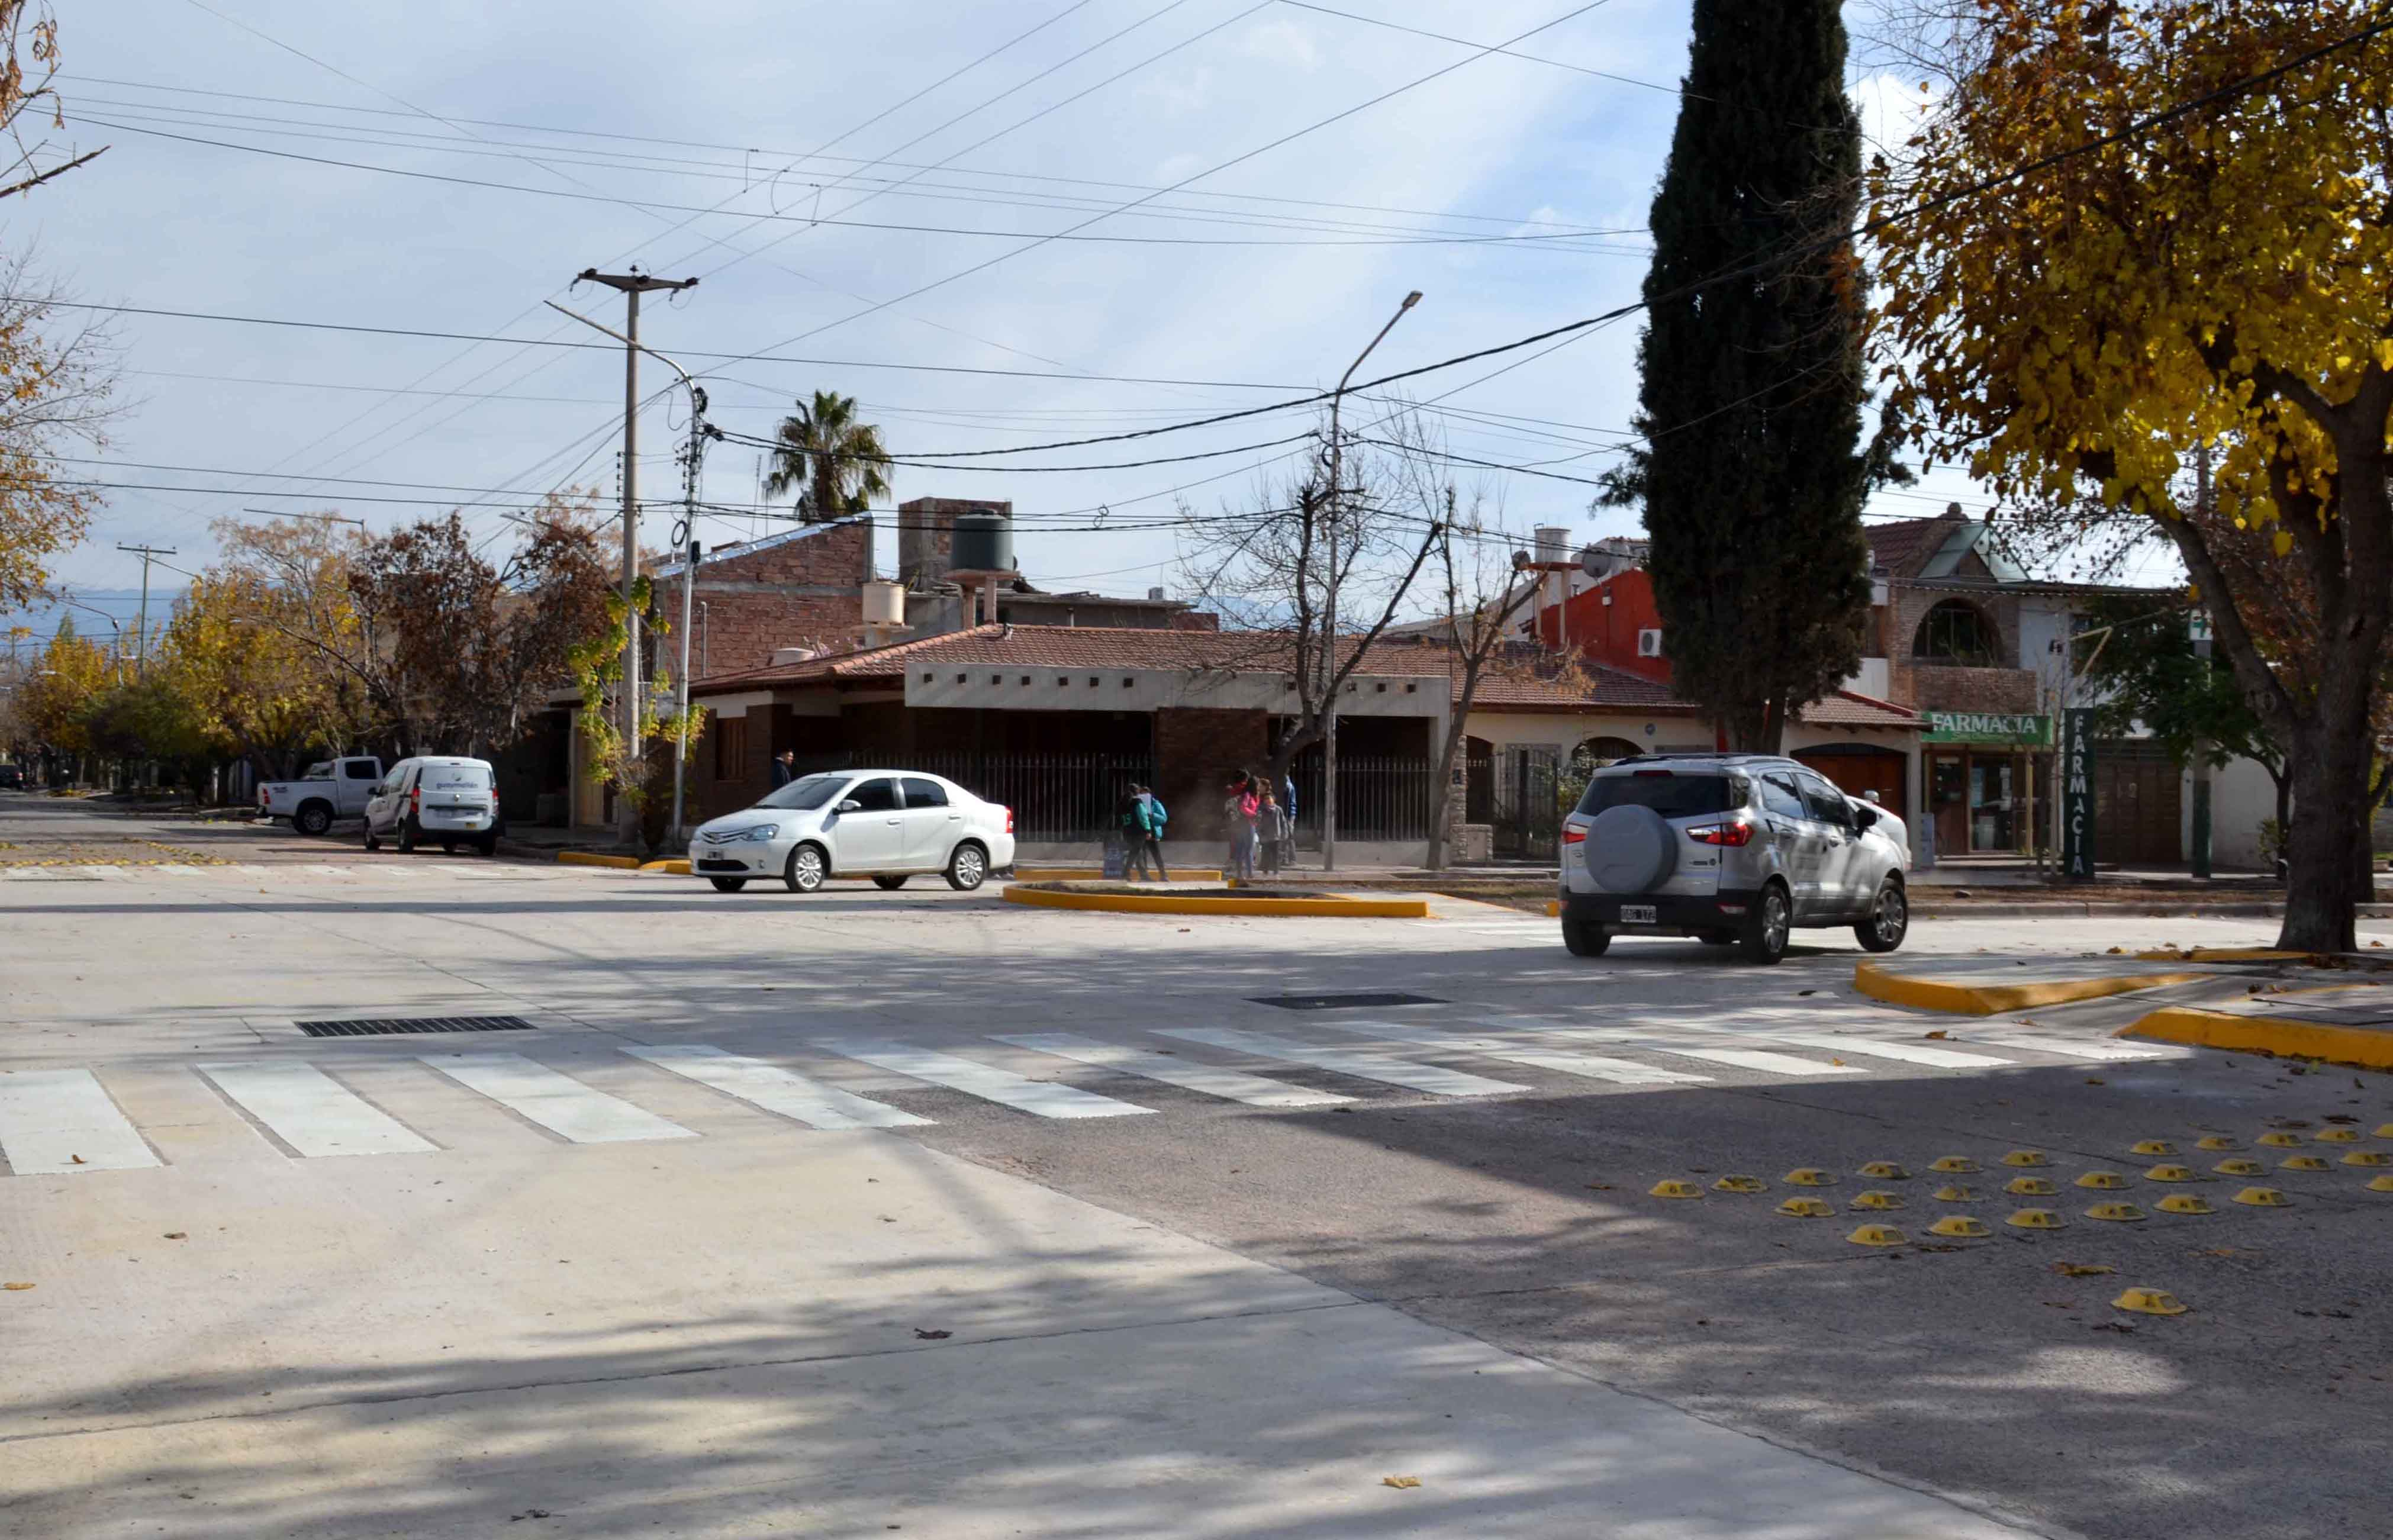 Houssay y Cochabamba - habilitado (7) (1)